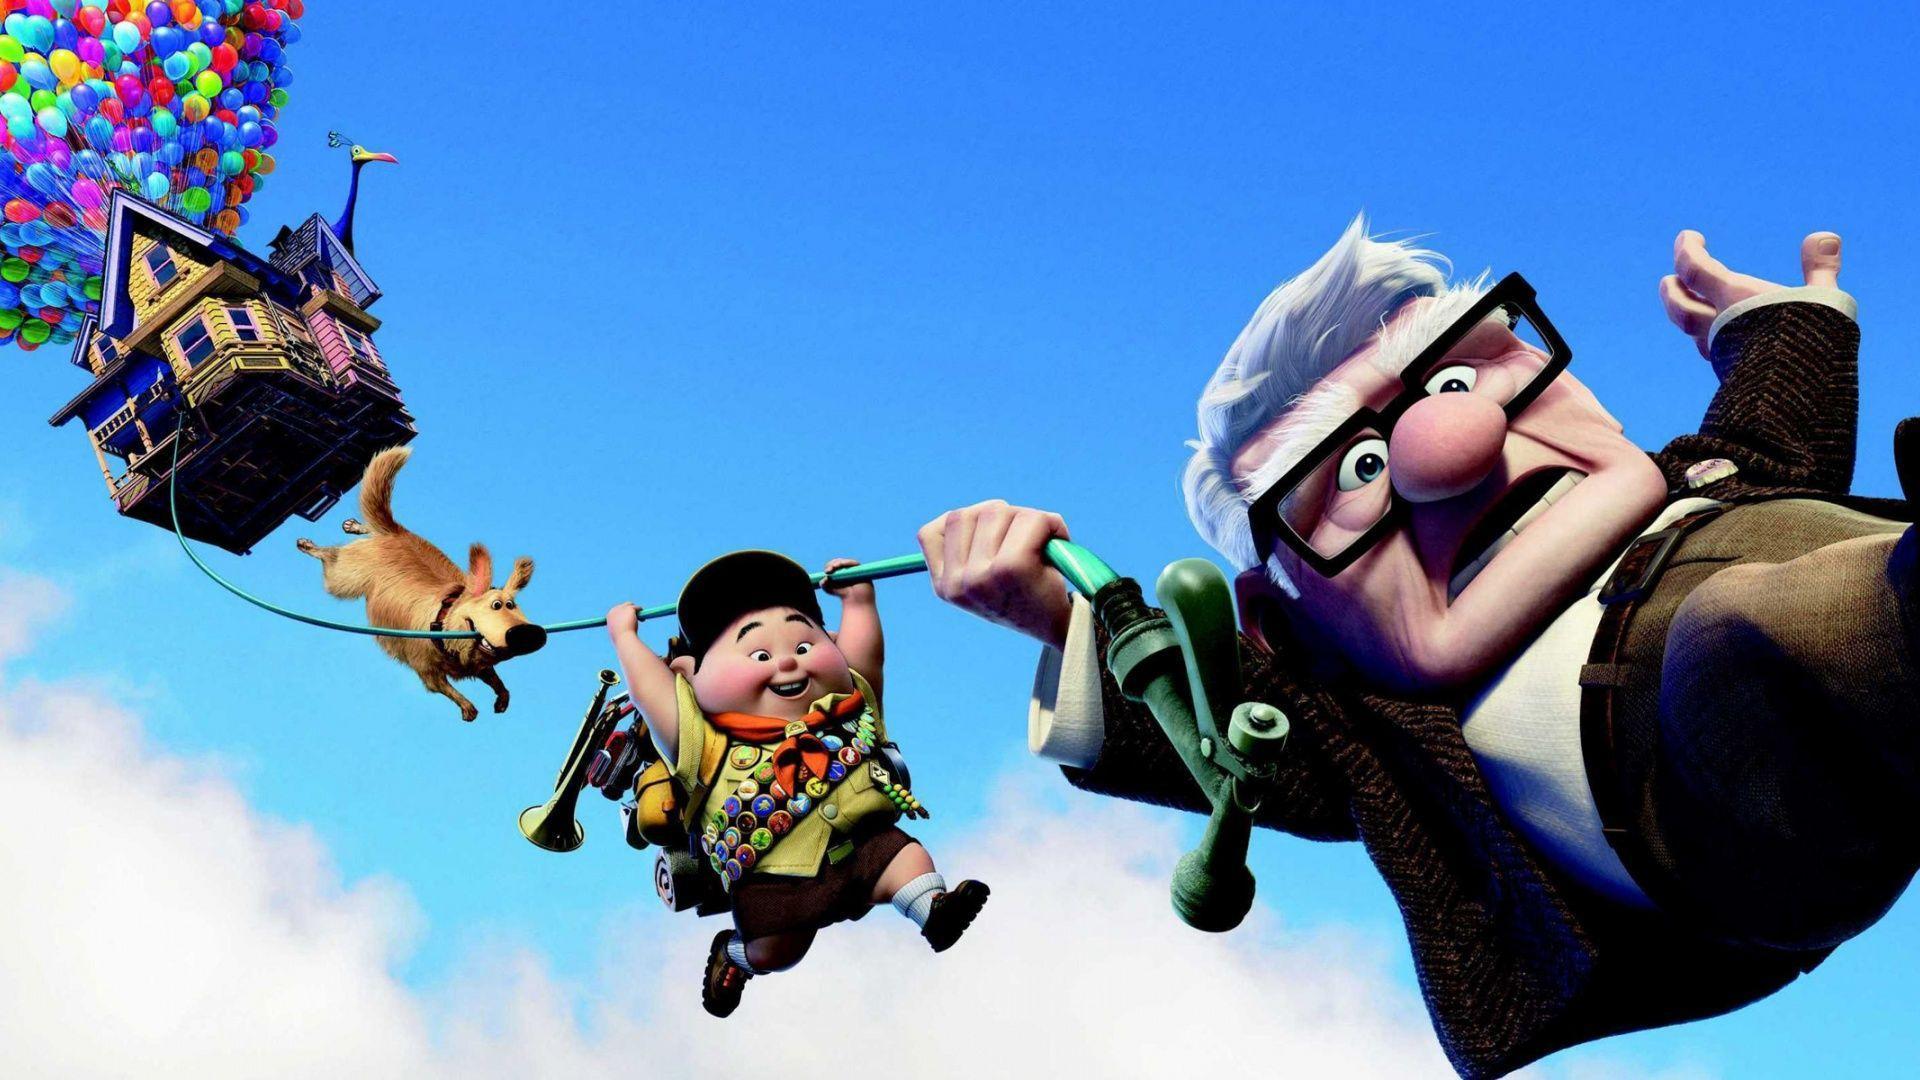 disney pixar up movie free download